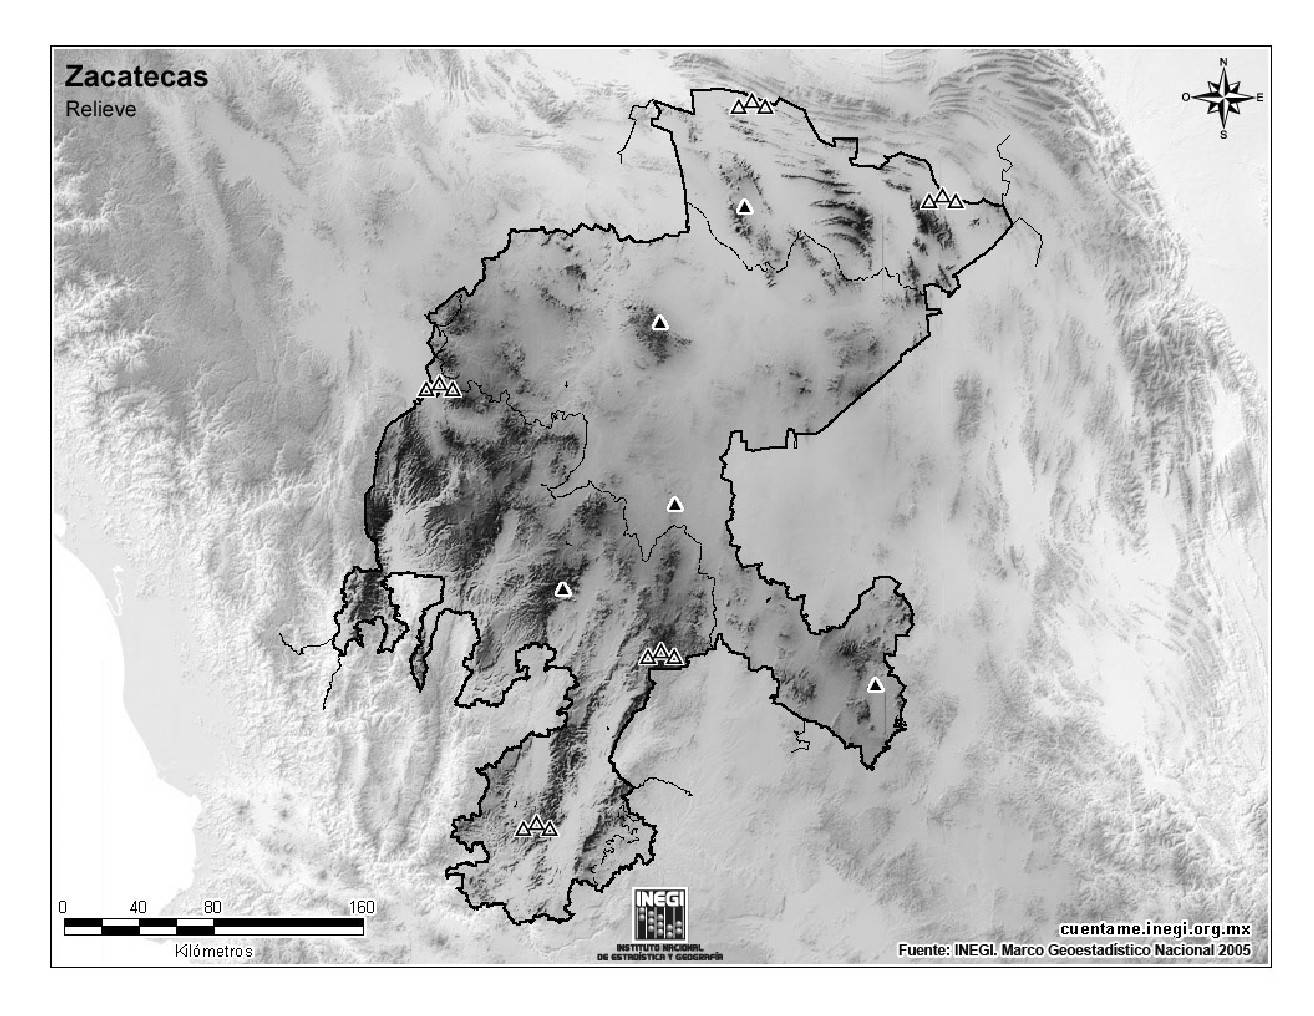 Mapa mudo de montañas de Zacatecas. INEGI de México